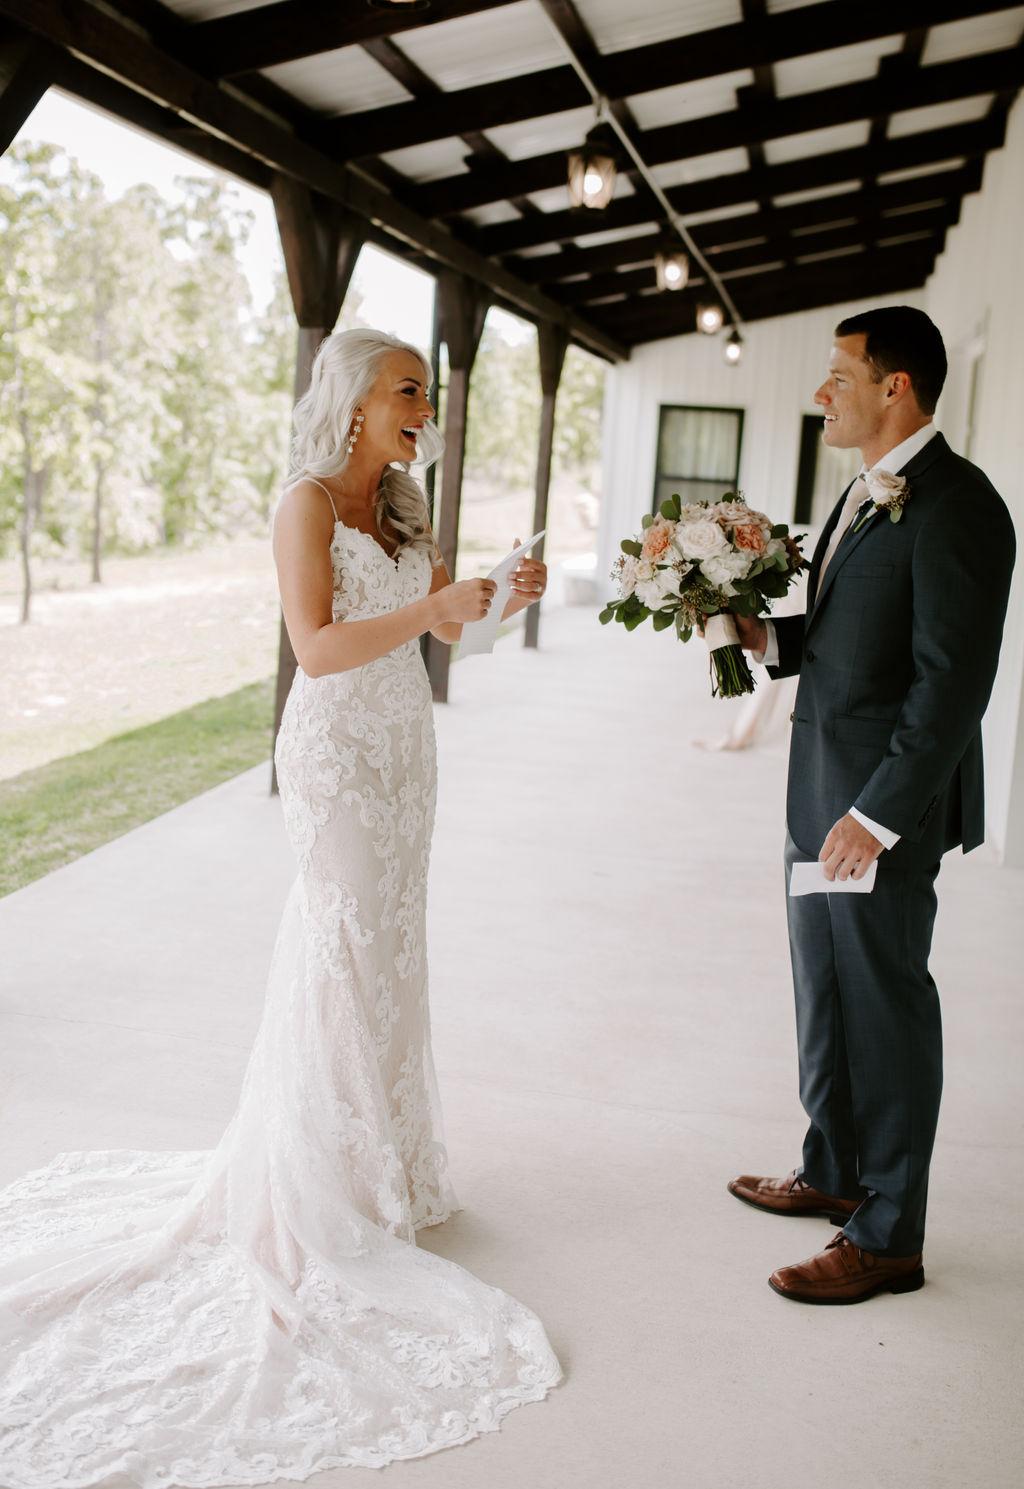 Best Oklahoma Outdoor Wedding Venue Tulsa Bixby White Barn 14.jpg